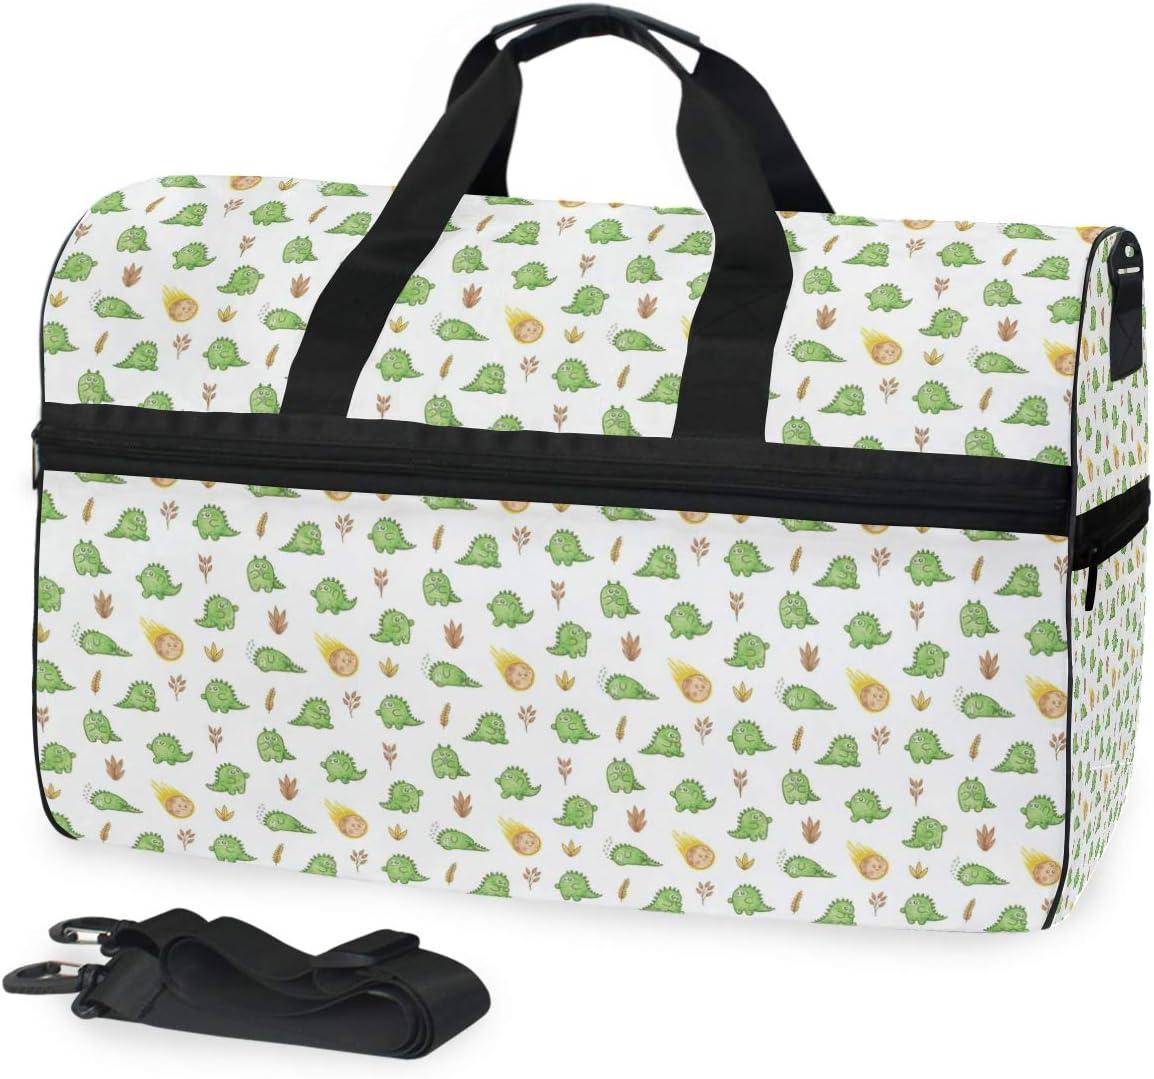 MALPLENA Cartoon Dinosaur Sleep Packable Duffle Bag For Men Women Tear Resistant Sports Duffle